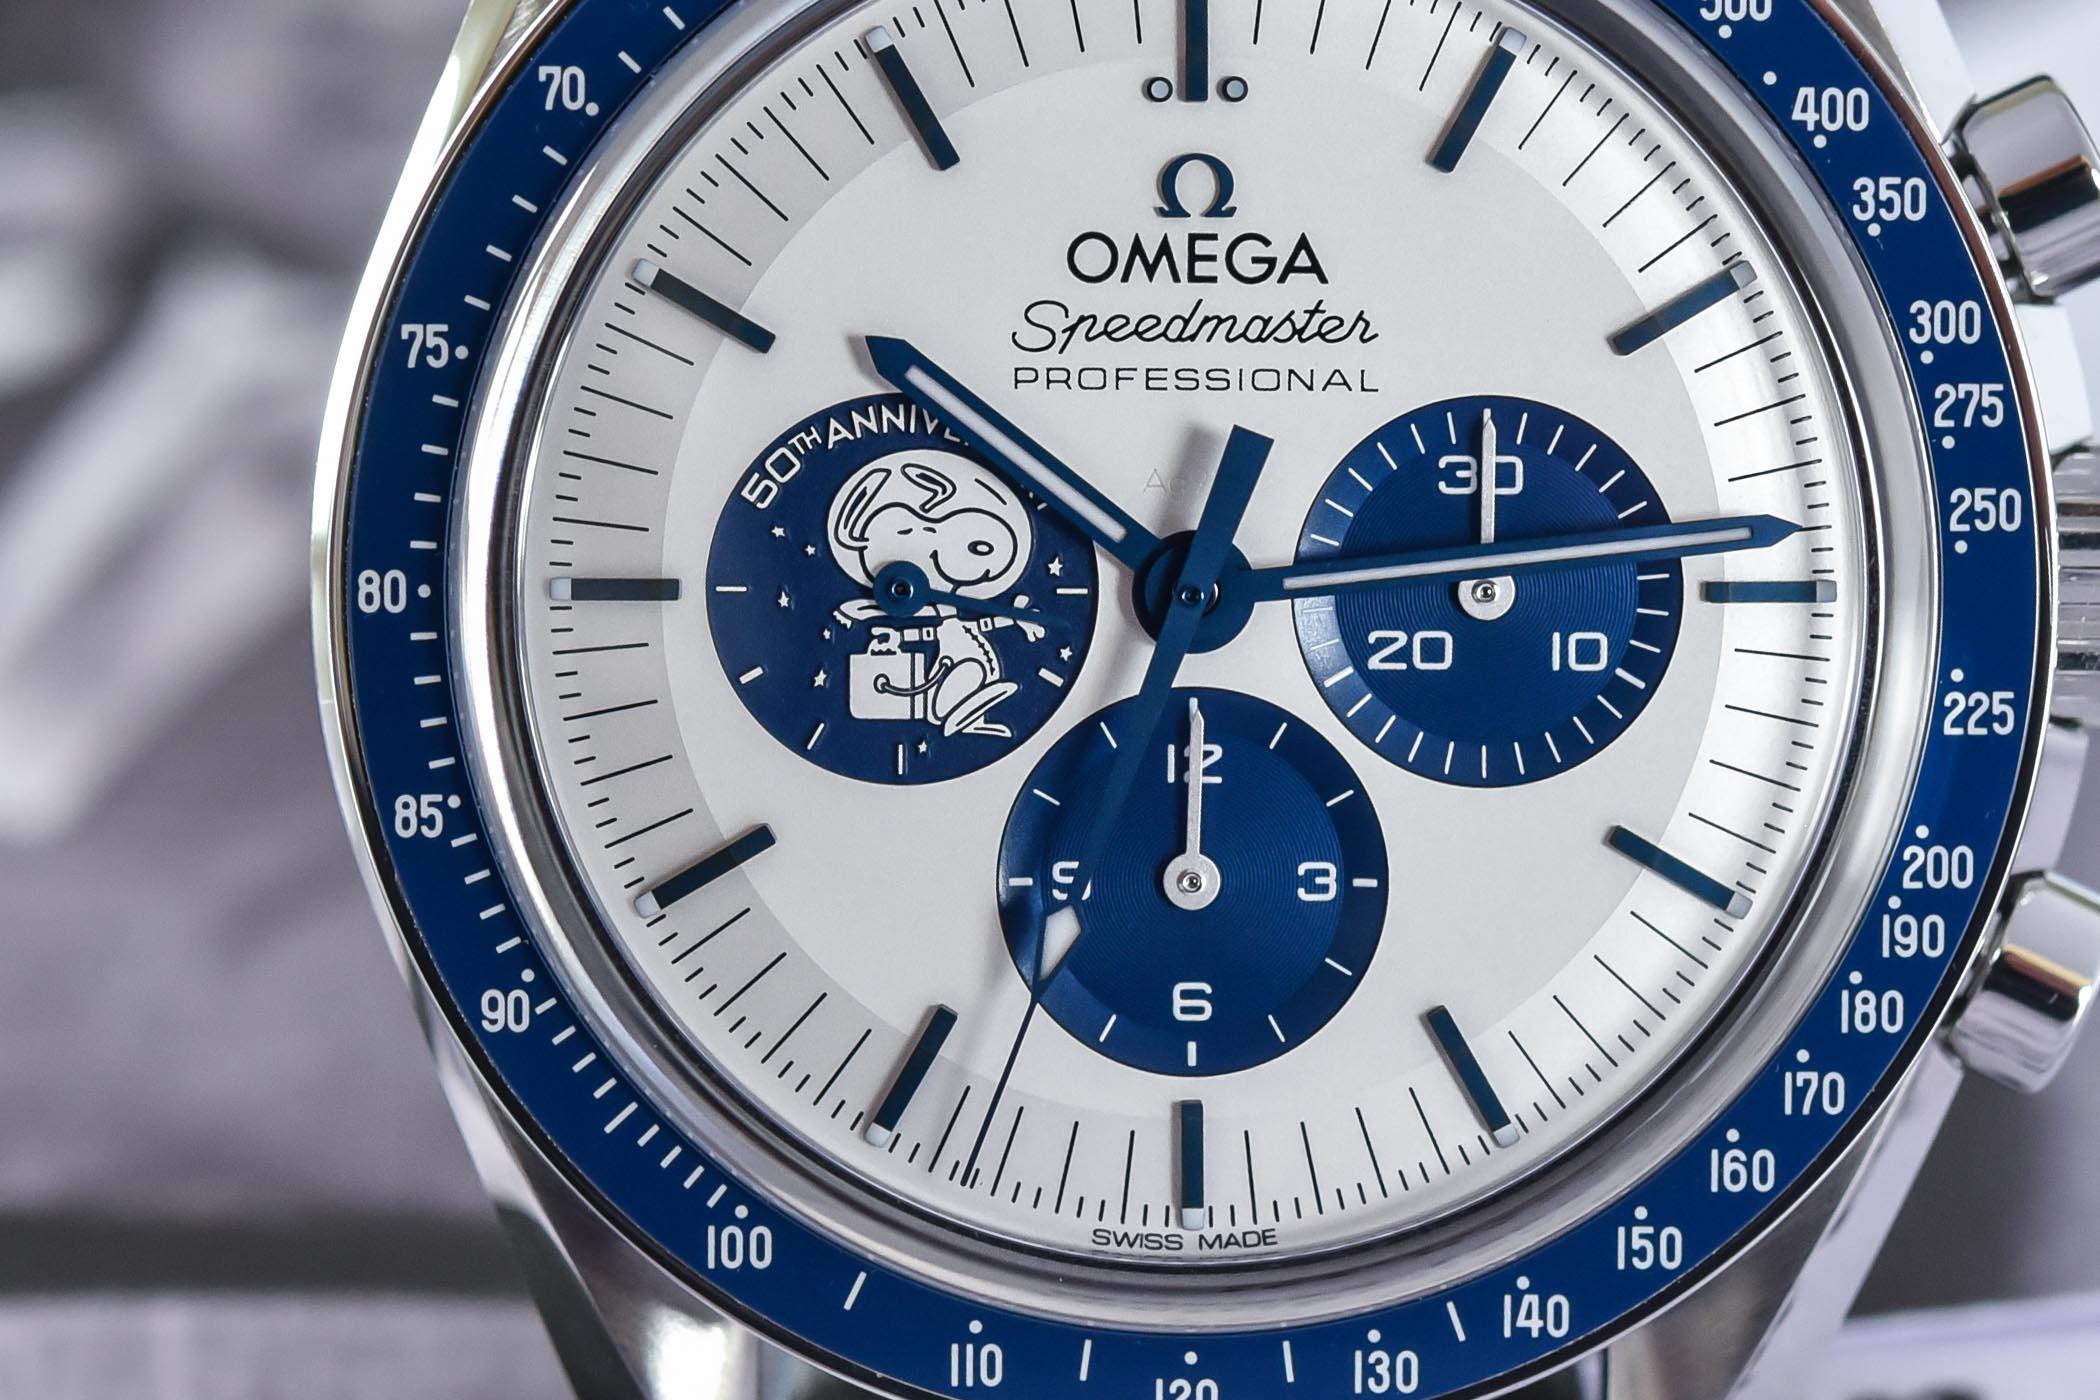 Omega Speedmaster Silver Snoopy Award 50th Anniversary